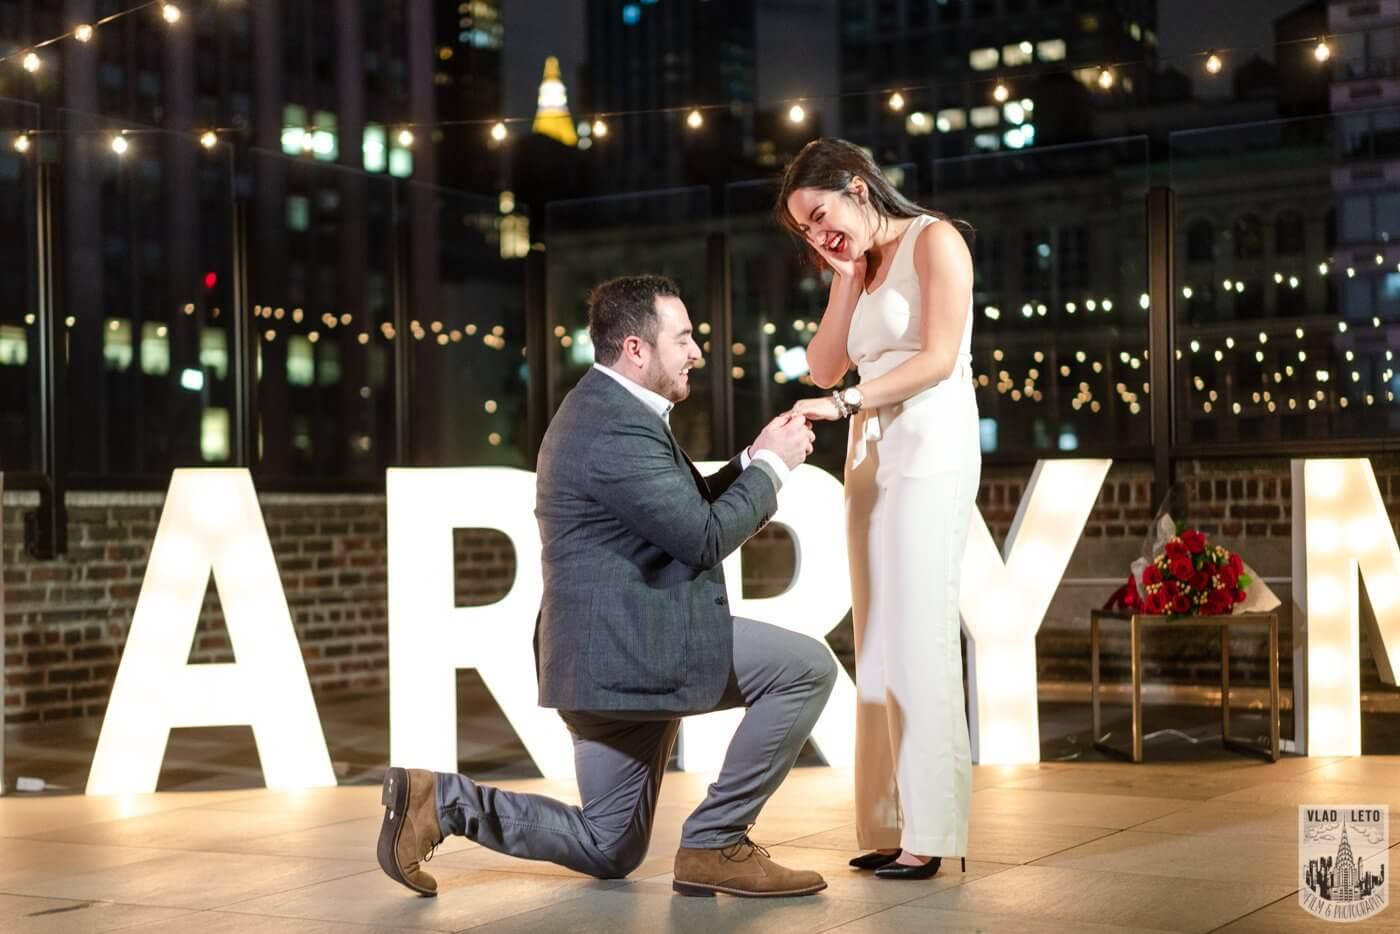 Photo Gigantic Marry Me Letters Rooftop Proposal | VladLeto